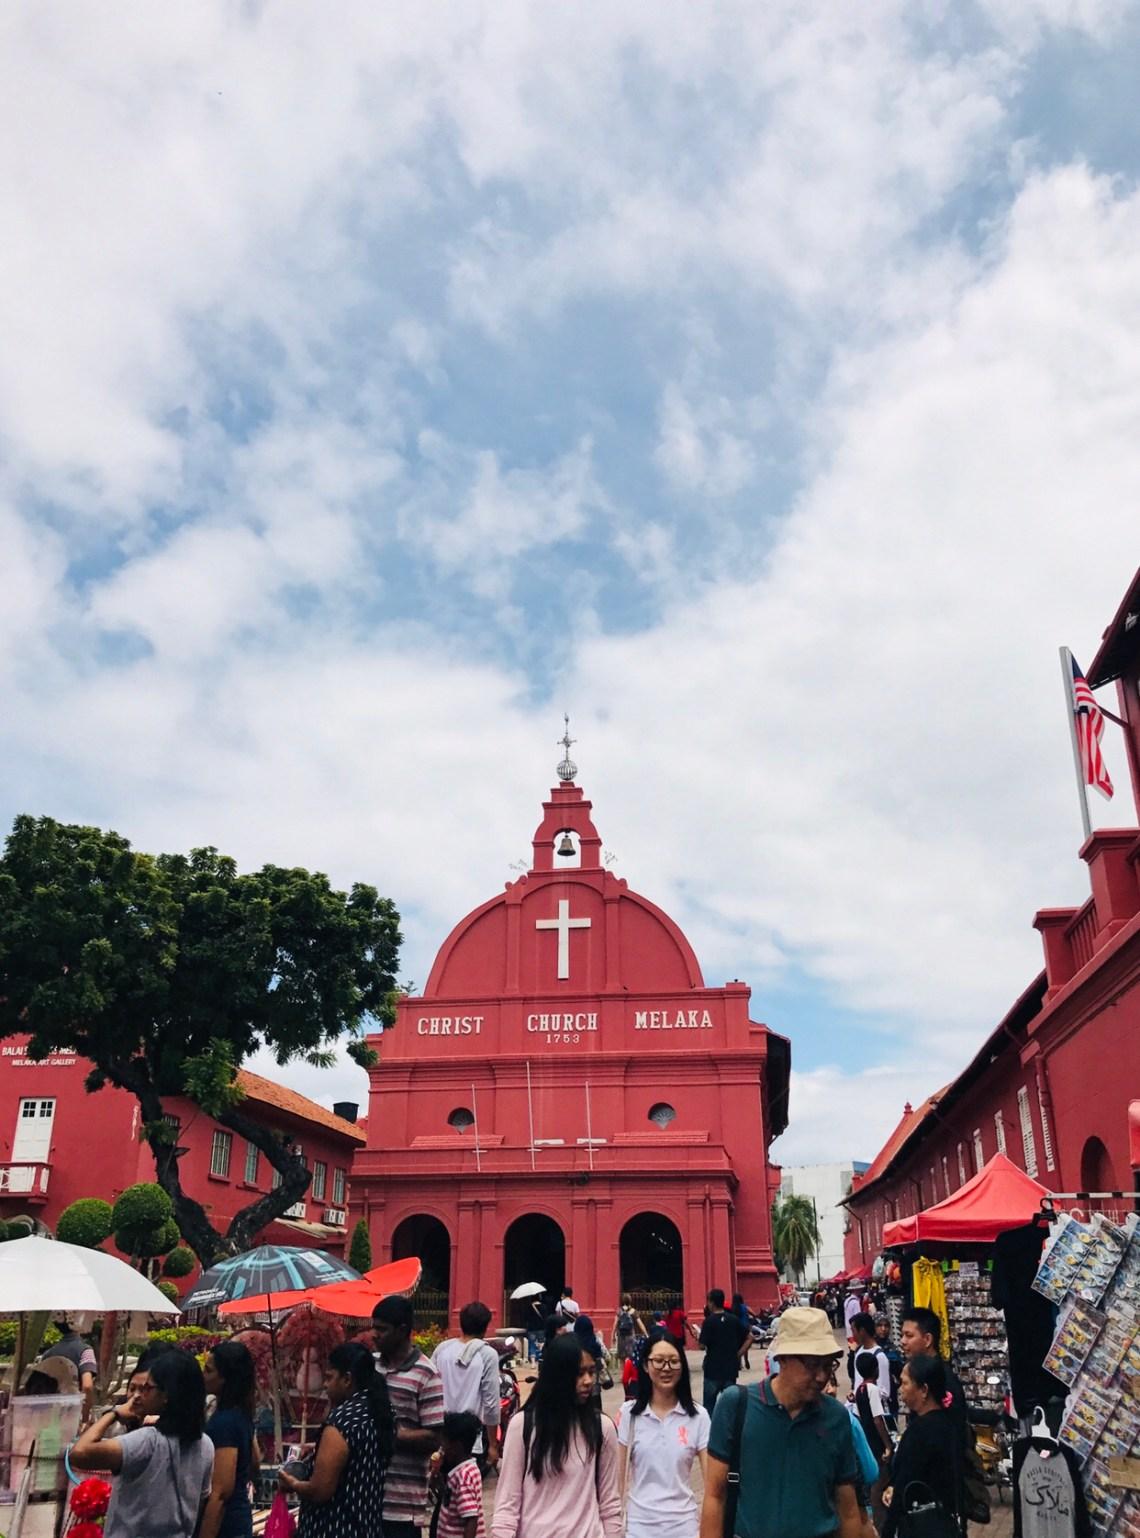 The Christ Church, Melaka